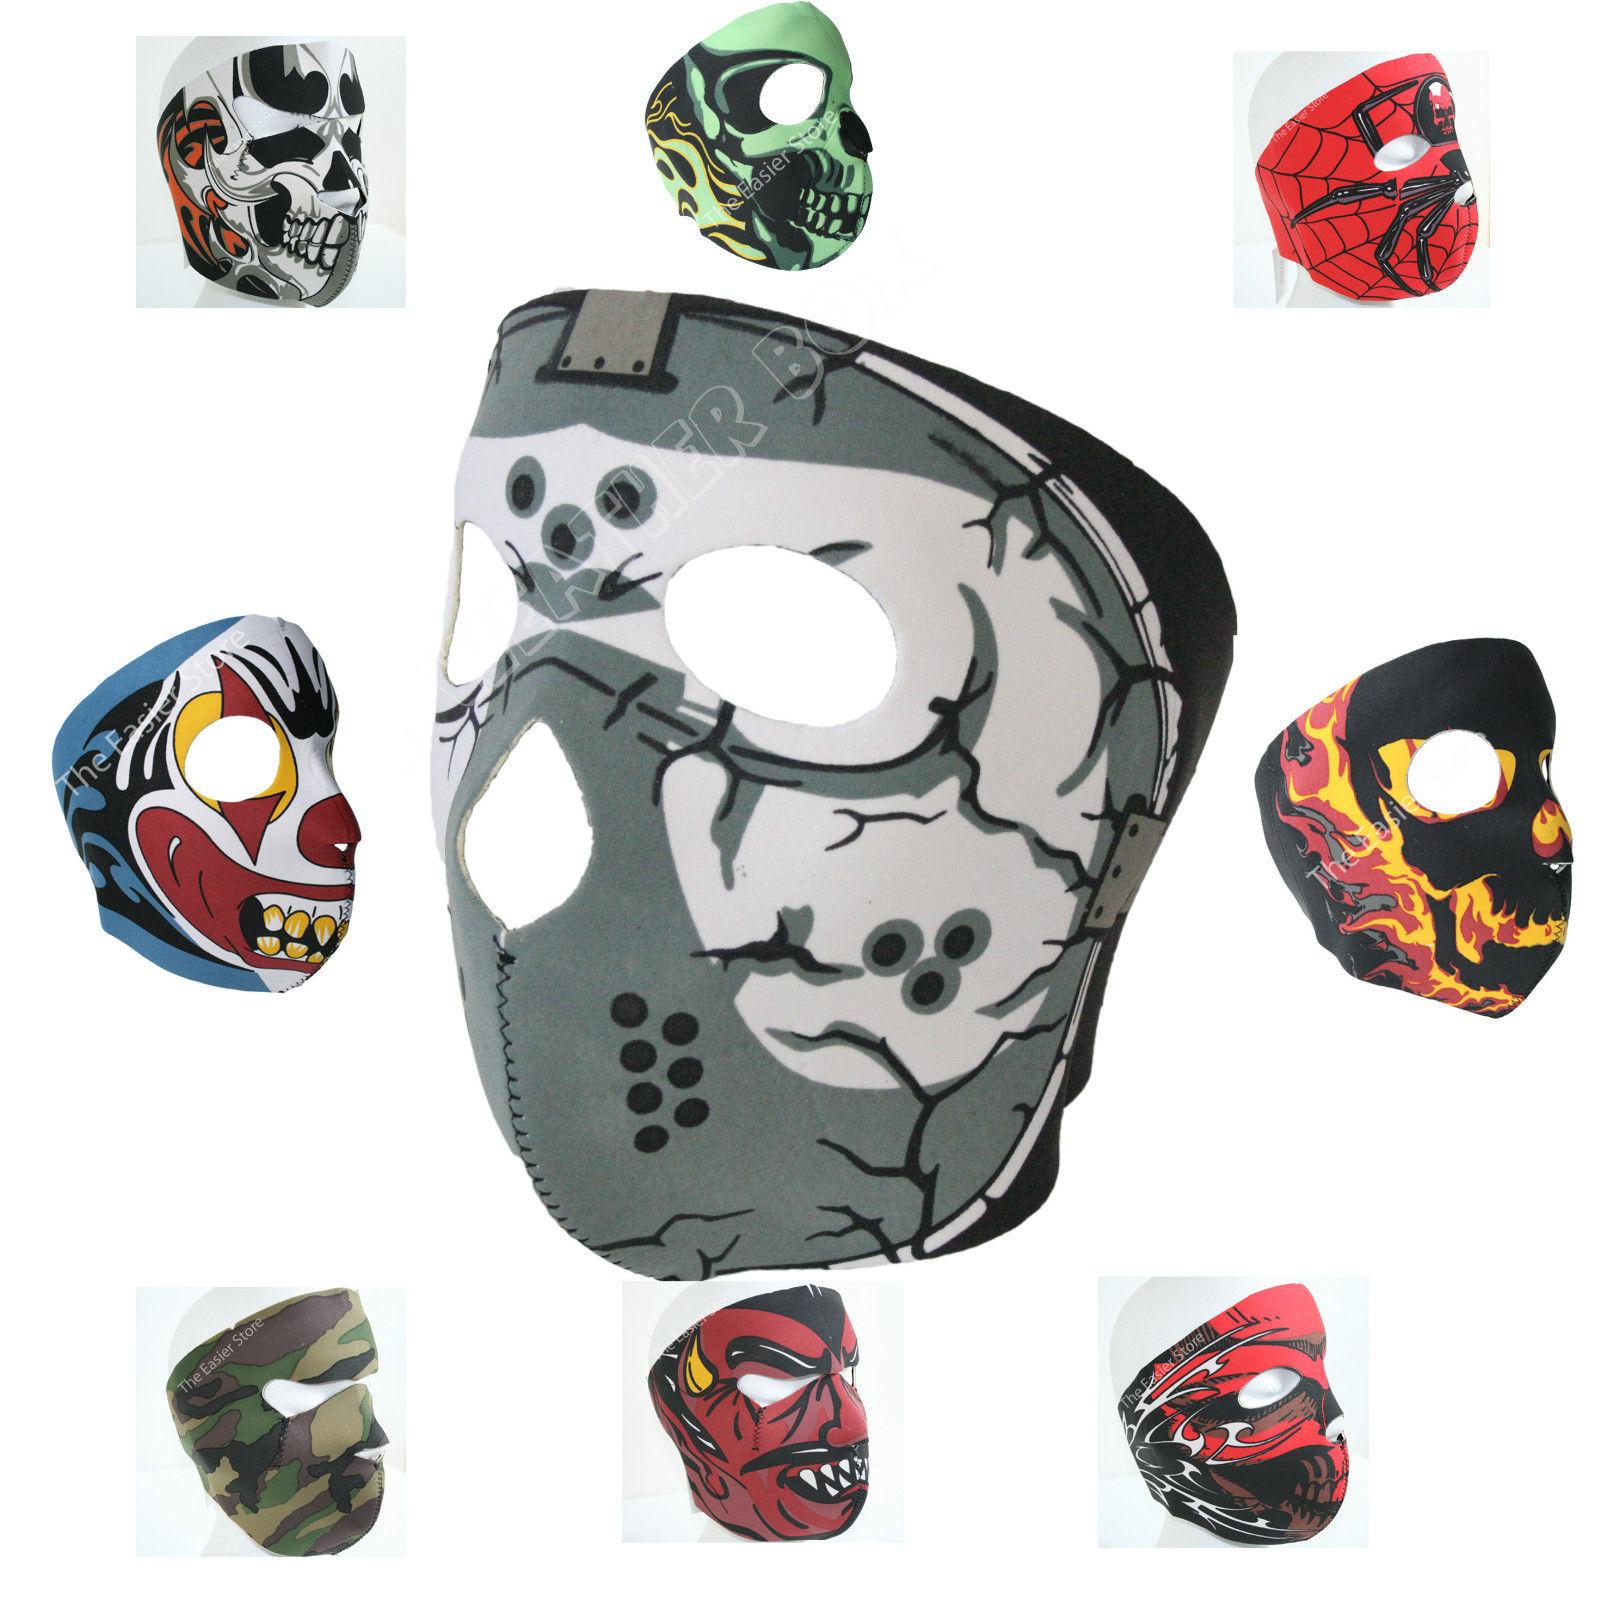 Neoprene-Full-Face-Mask-Motorbike-Biker-Ski-Paintball-Snowboard-Sports-Balaclava